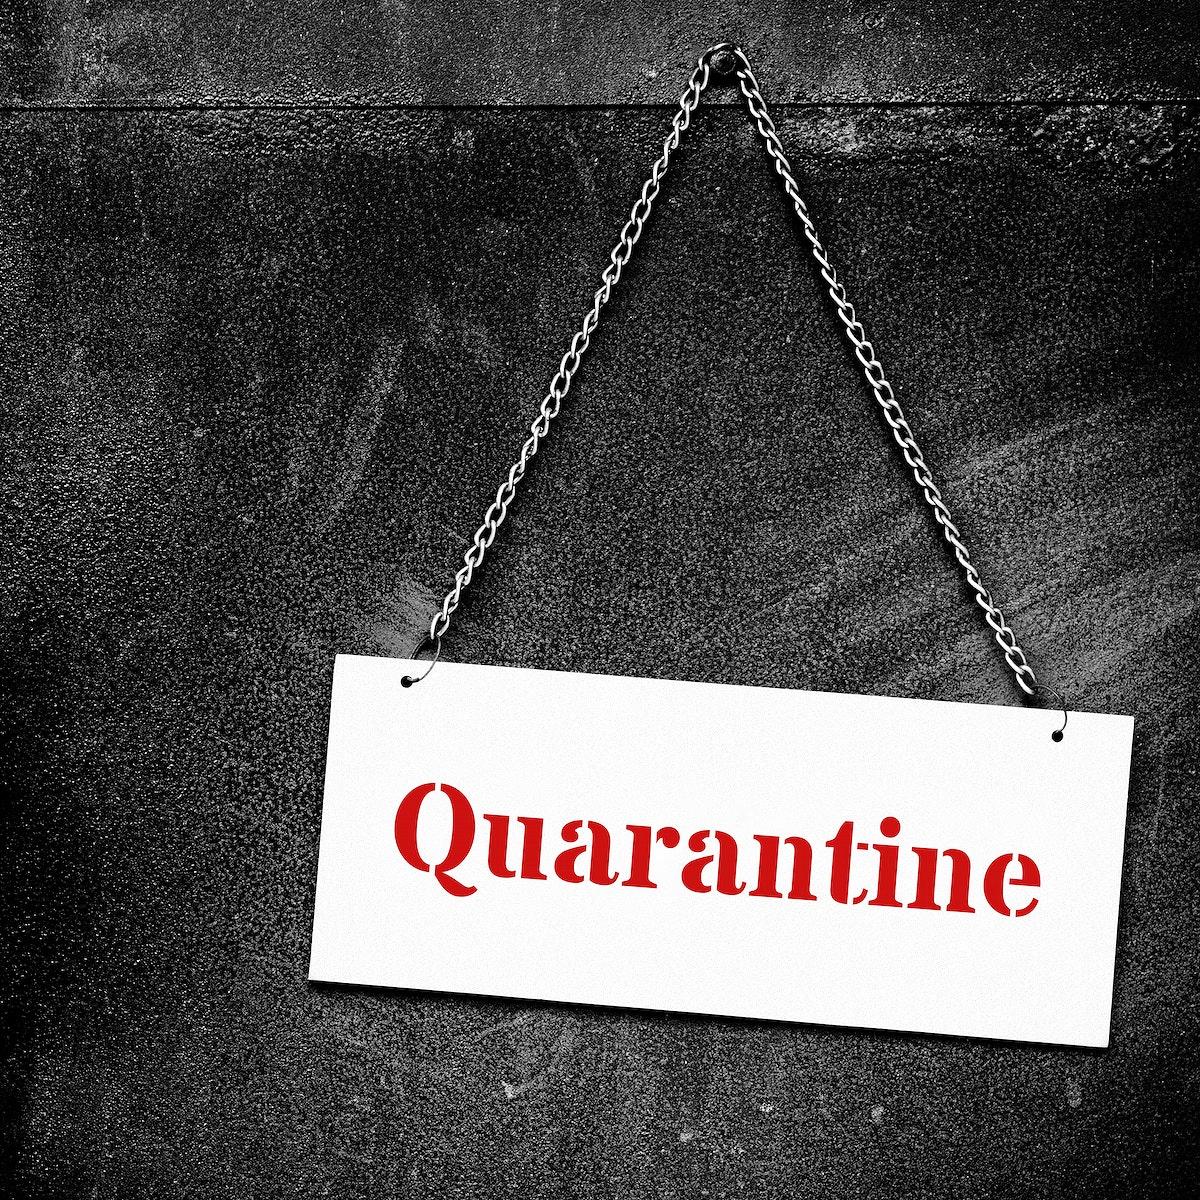 Quarantine during the coronavirus pandemic social banner